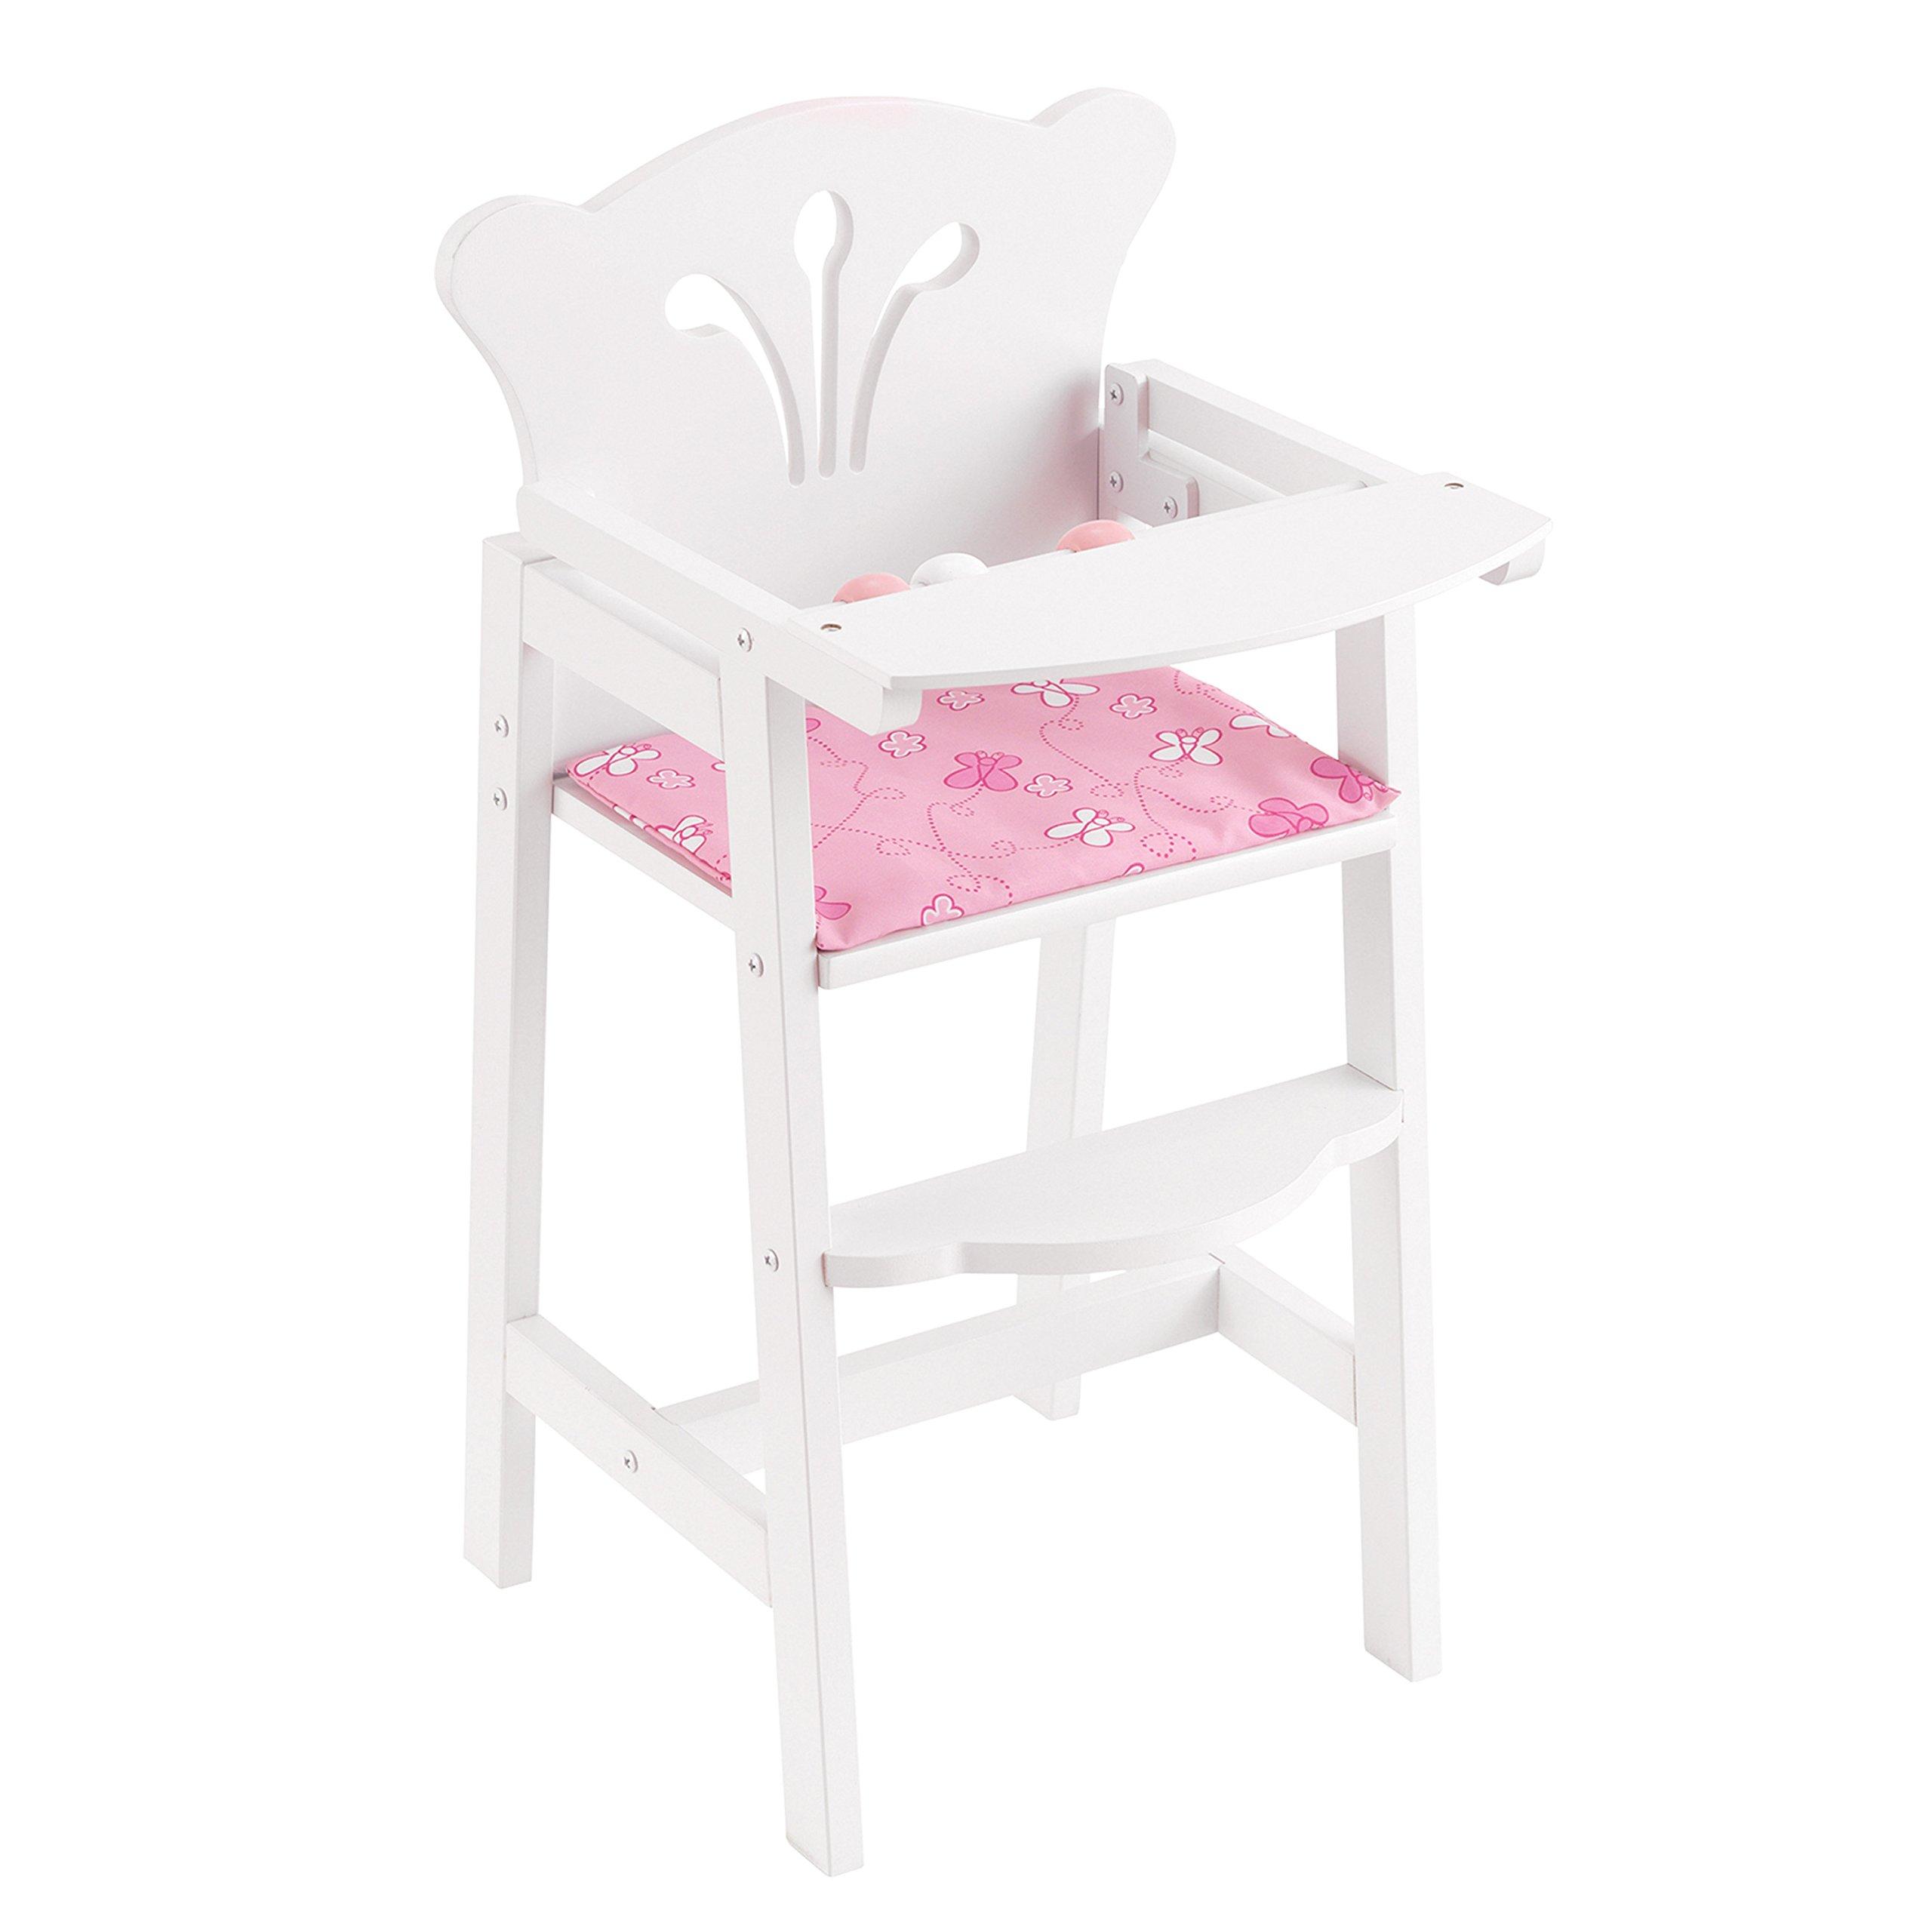 KidKraft Lil' Doll High Chair by KidKraft